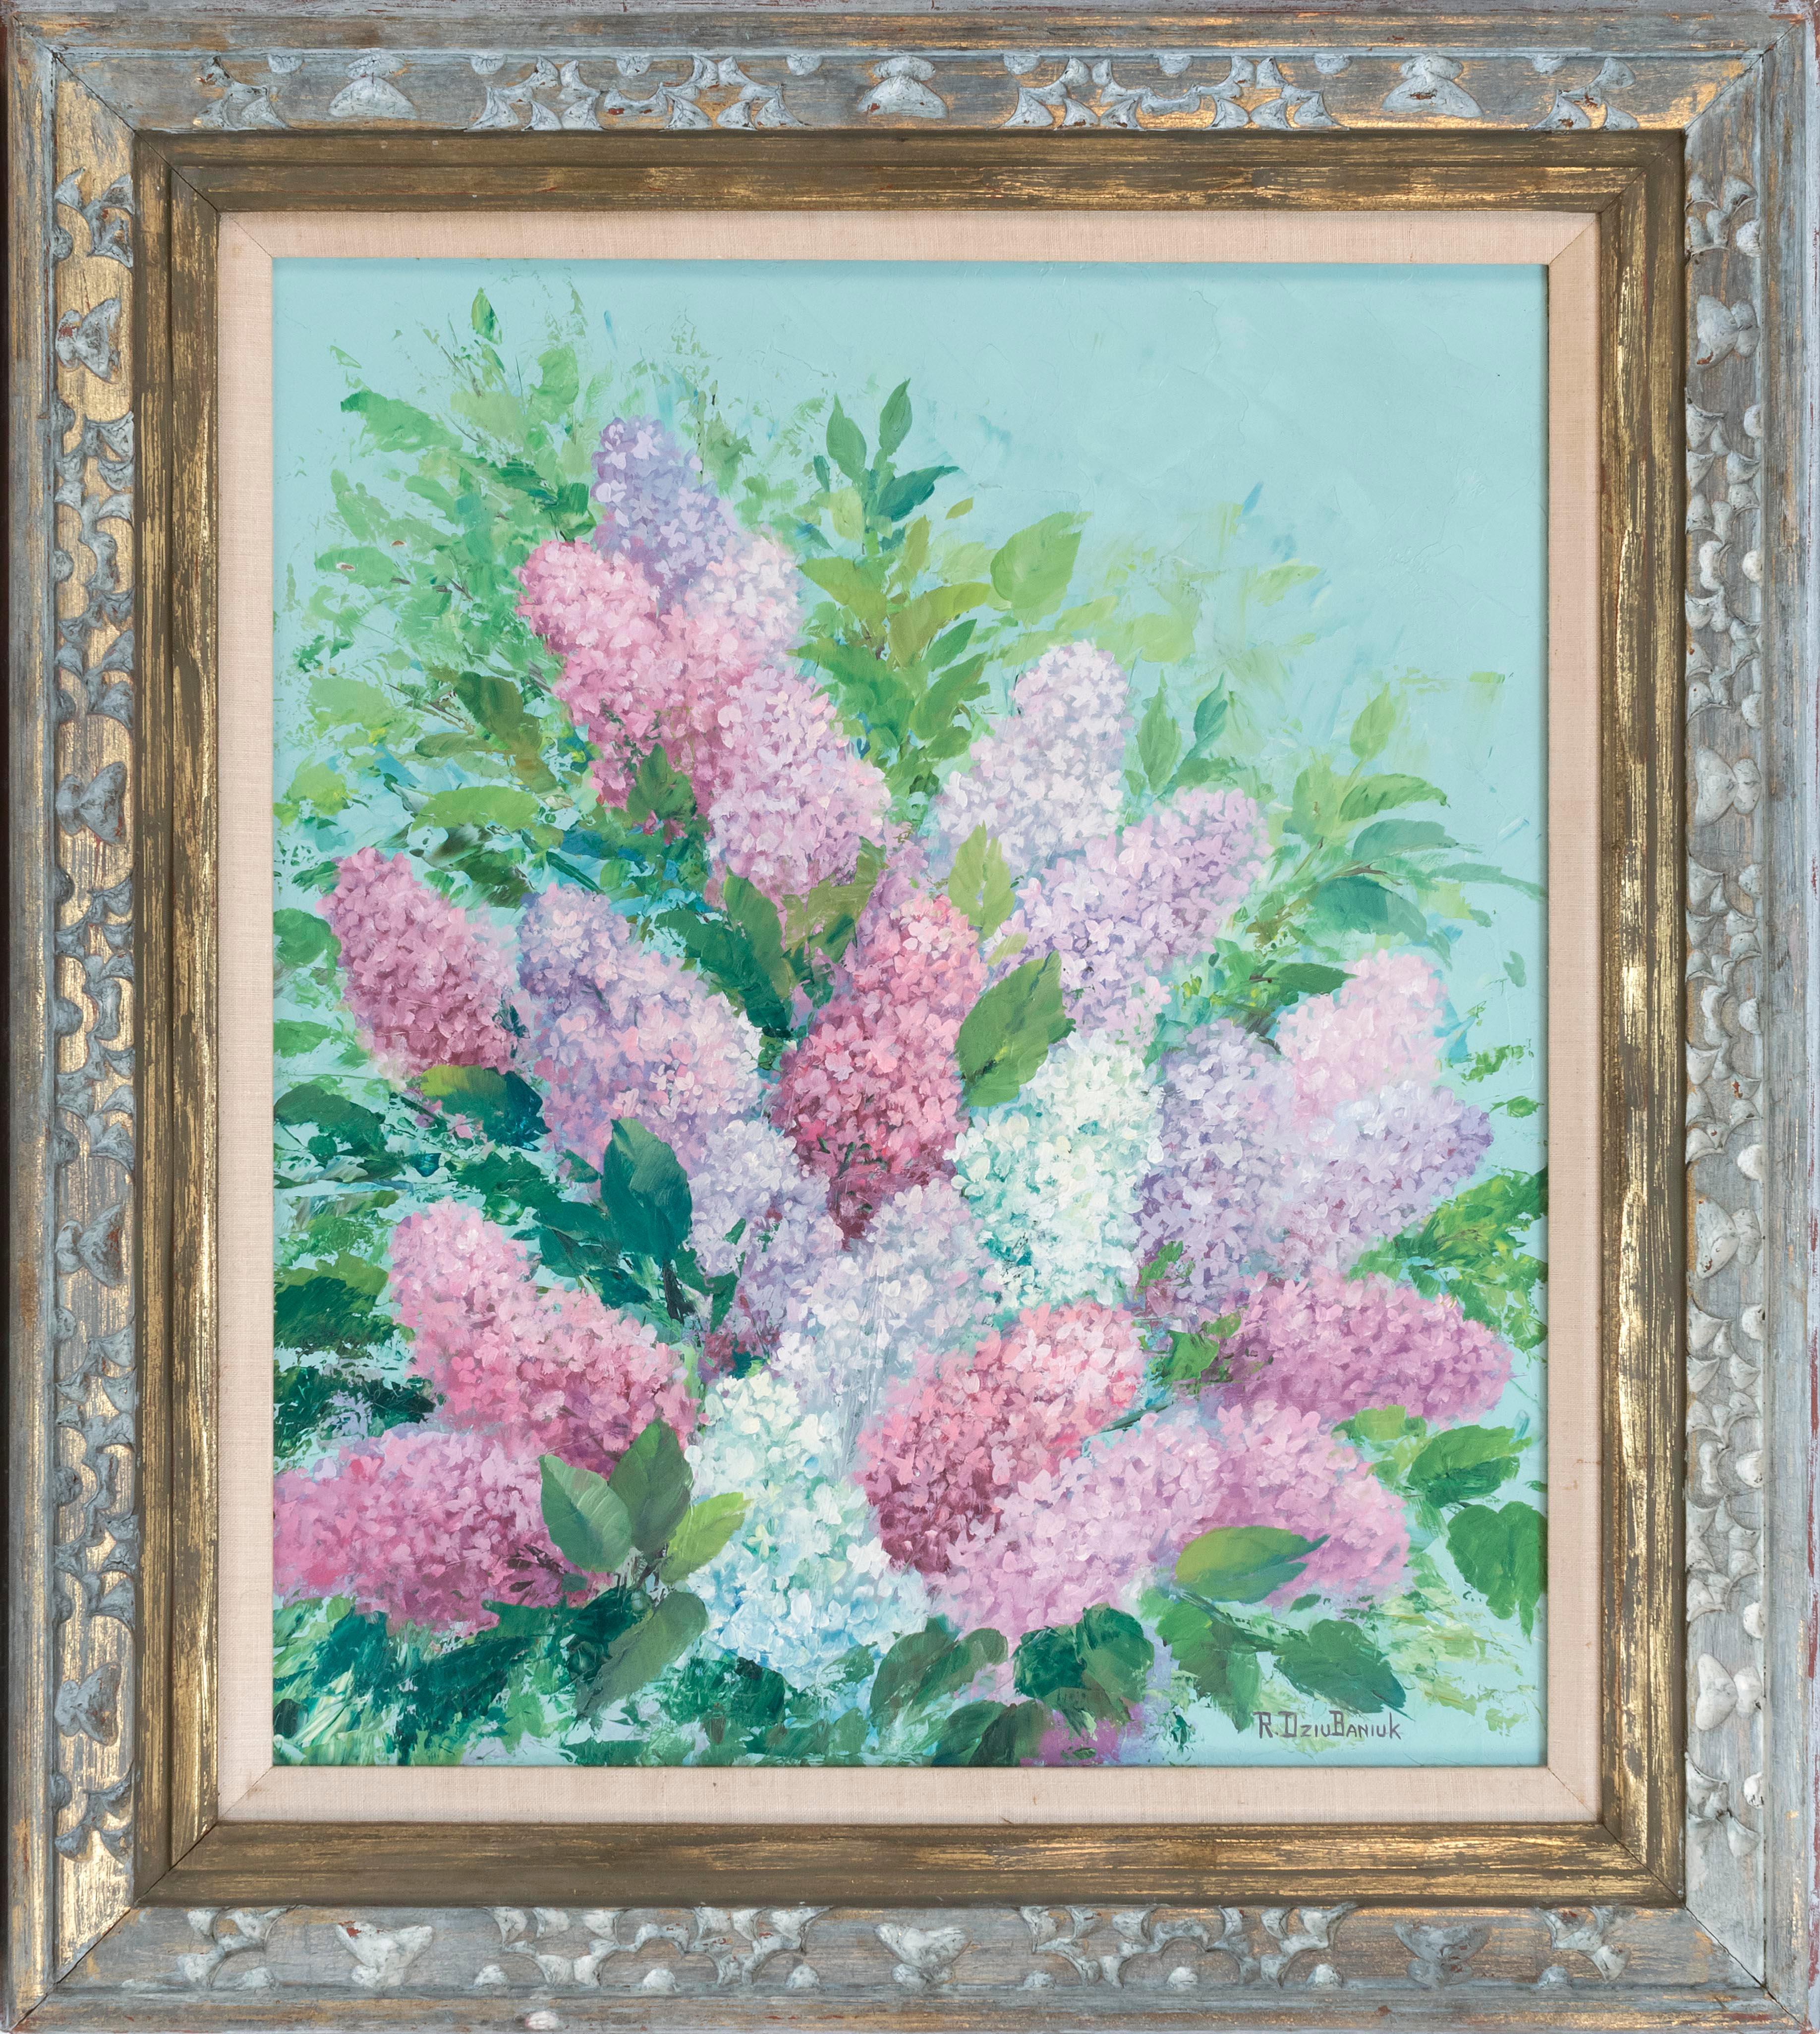 "ROBERT E. DZIUBANIUK, United States, Contemporary, Still life of lilacs., Oil on board, 24"" x 20"". Framed 32"" x 28""."